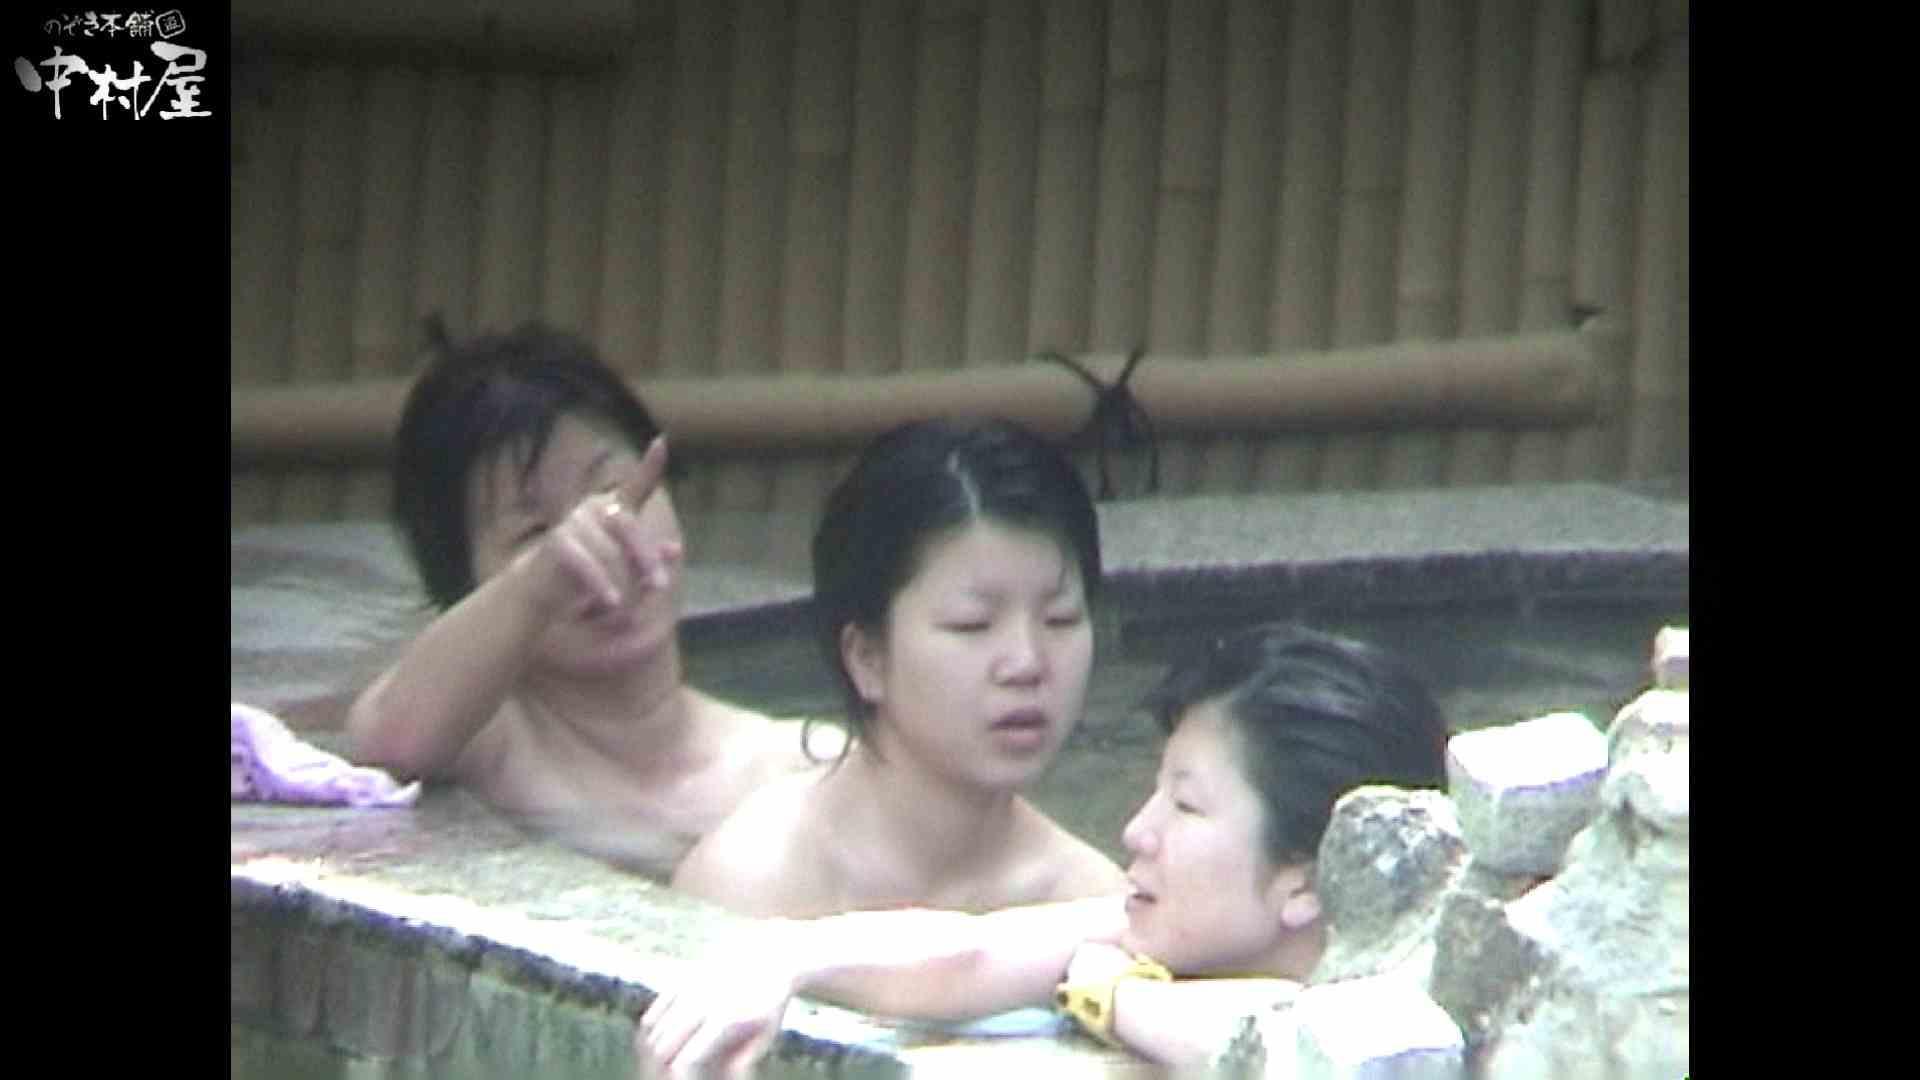 Aquaな露天風呂Vol.936 盗撮 AV無料 78枚 44